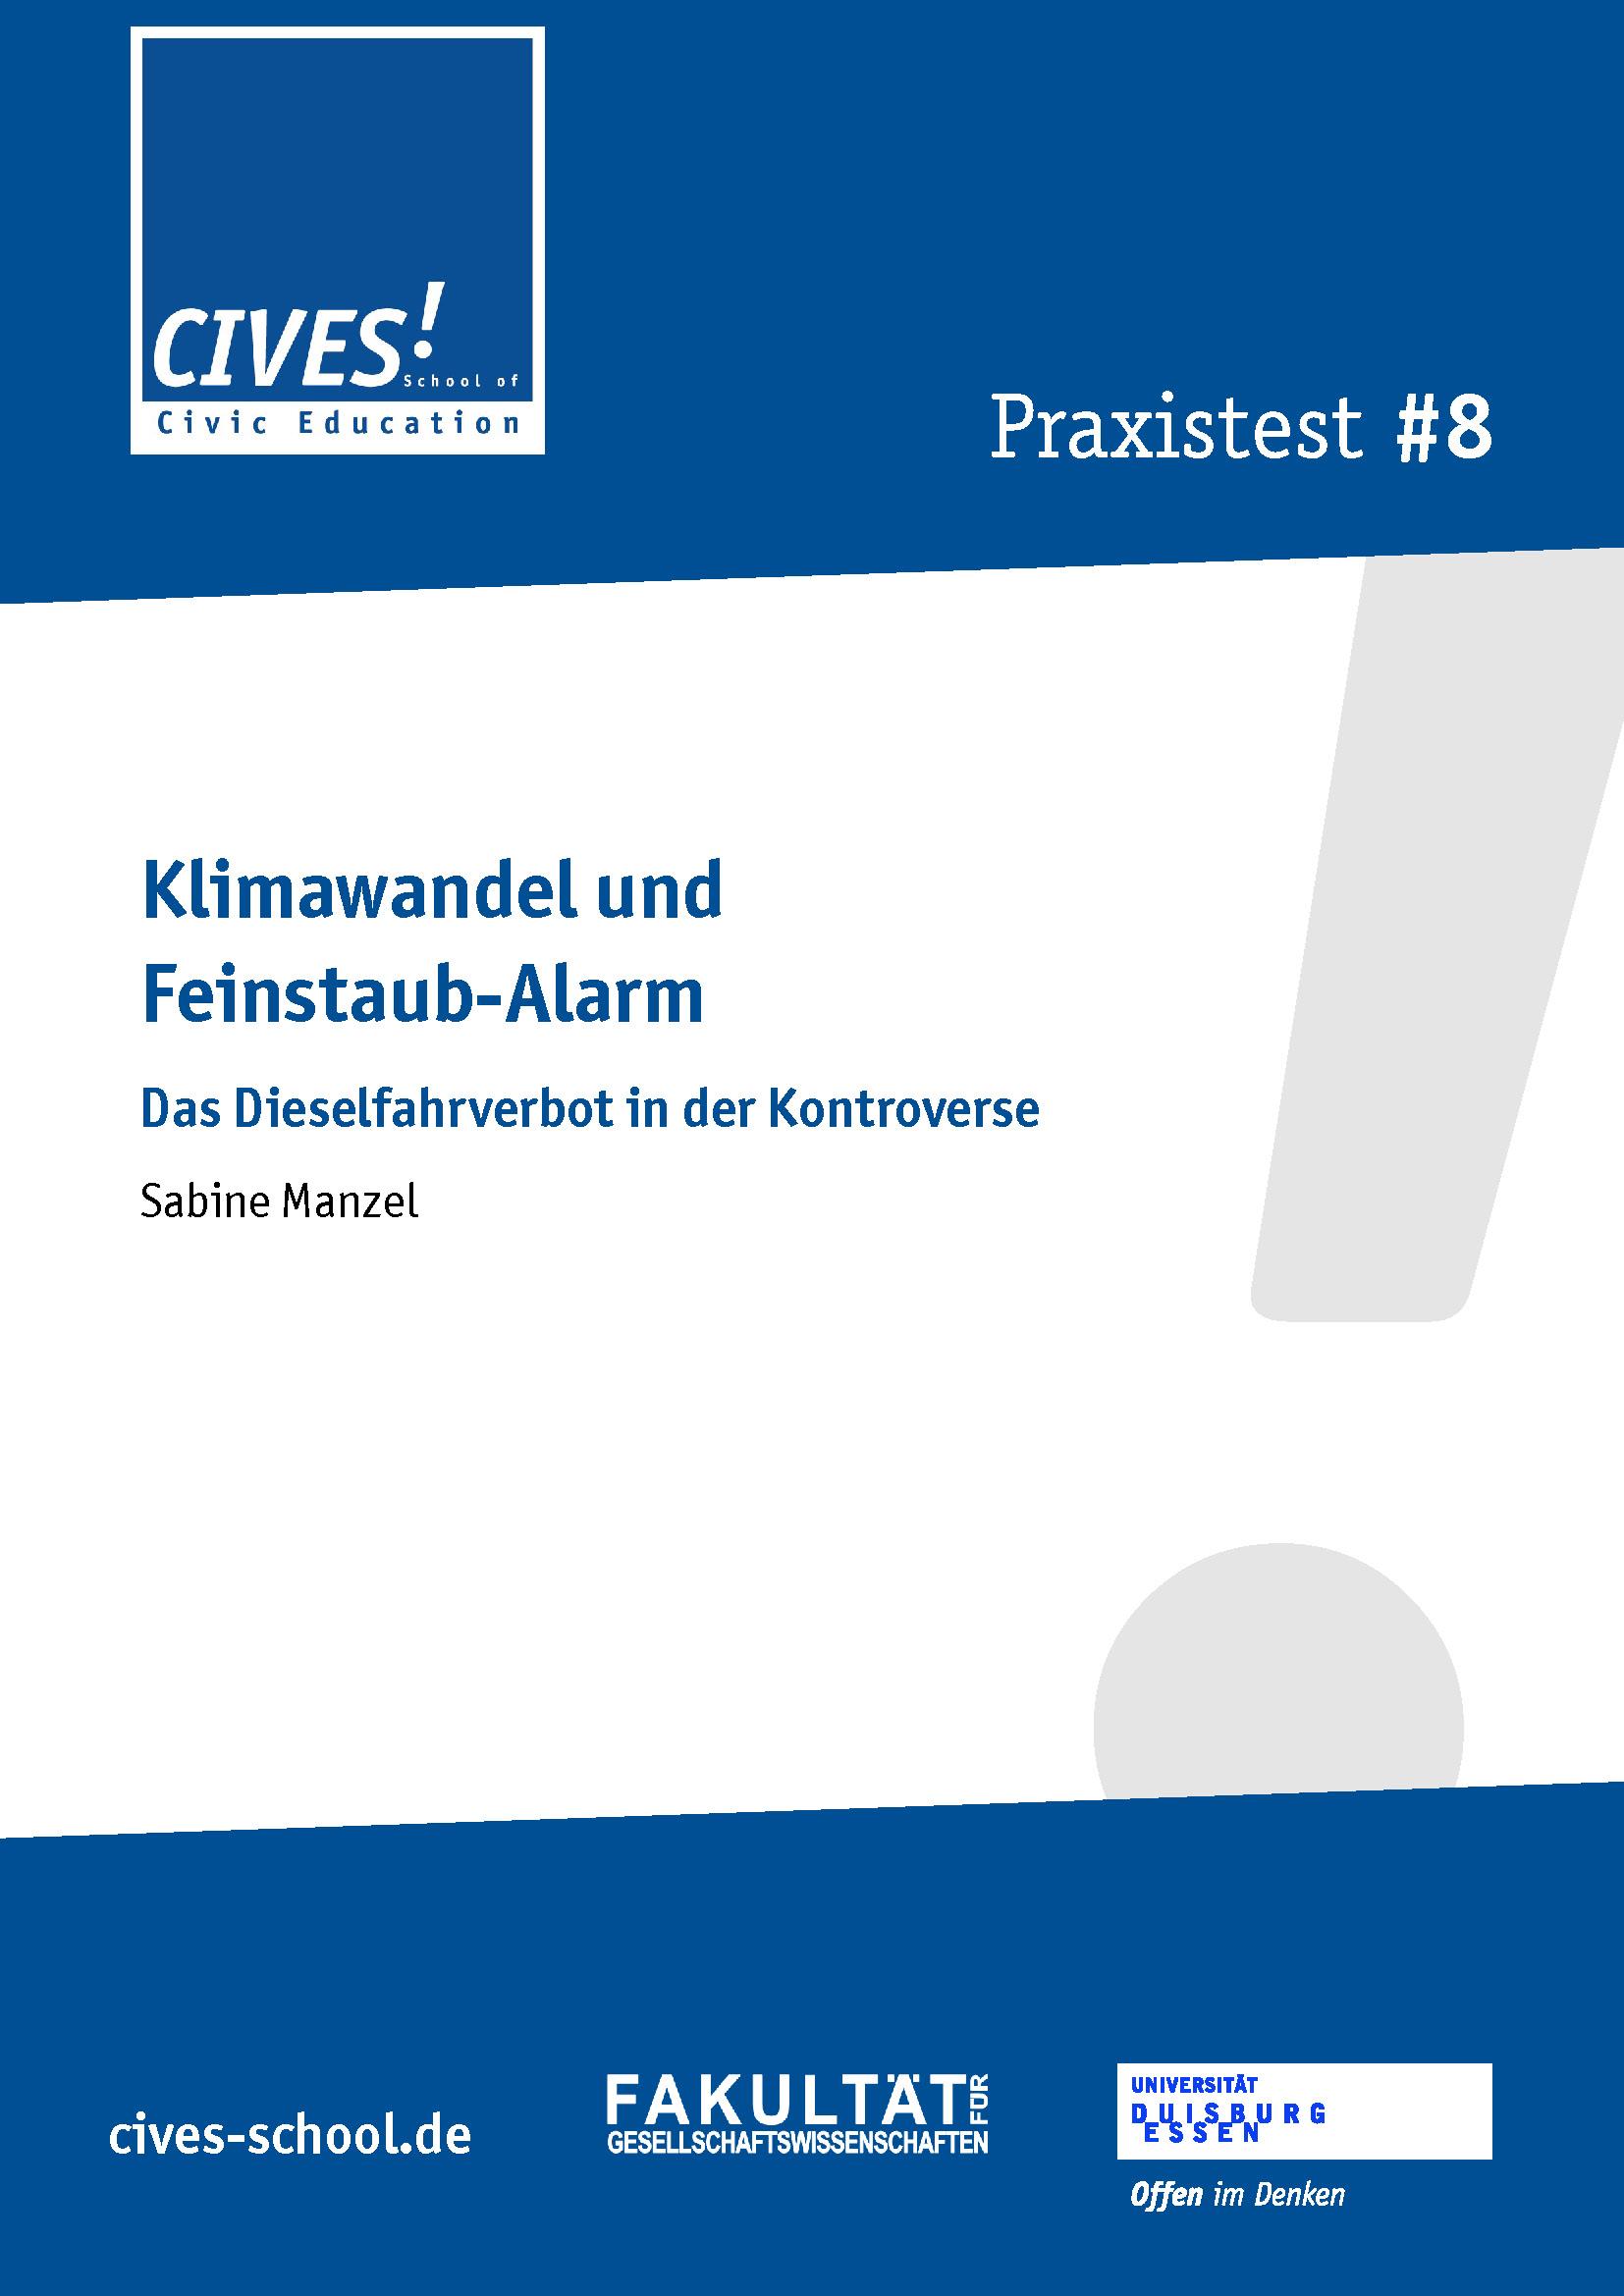 Cives-Praxistest-#8